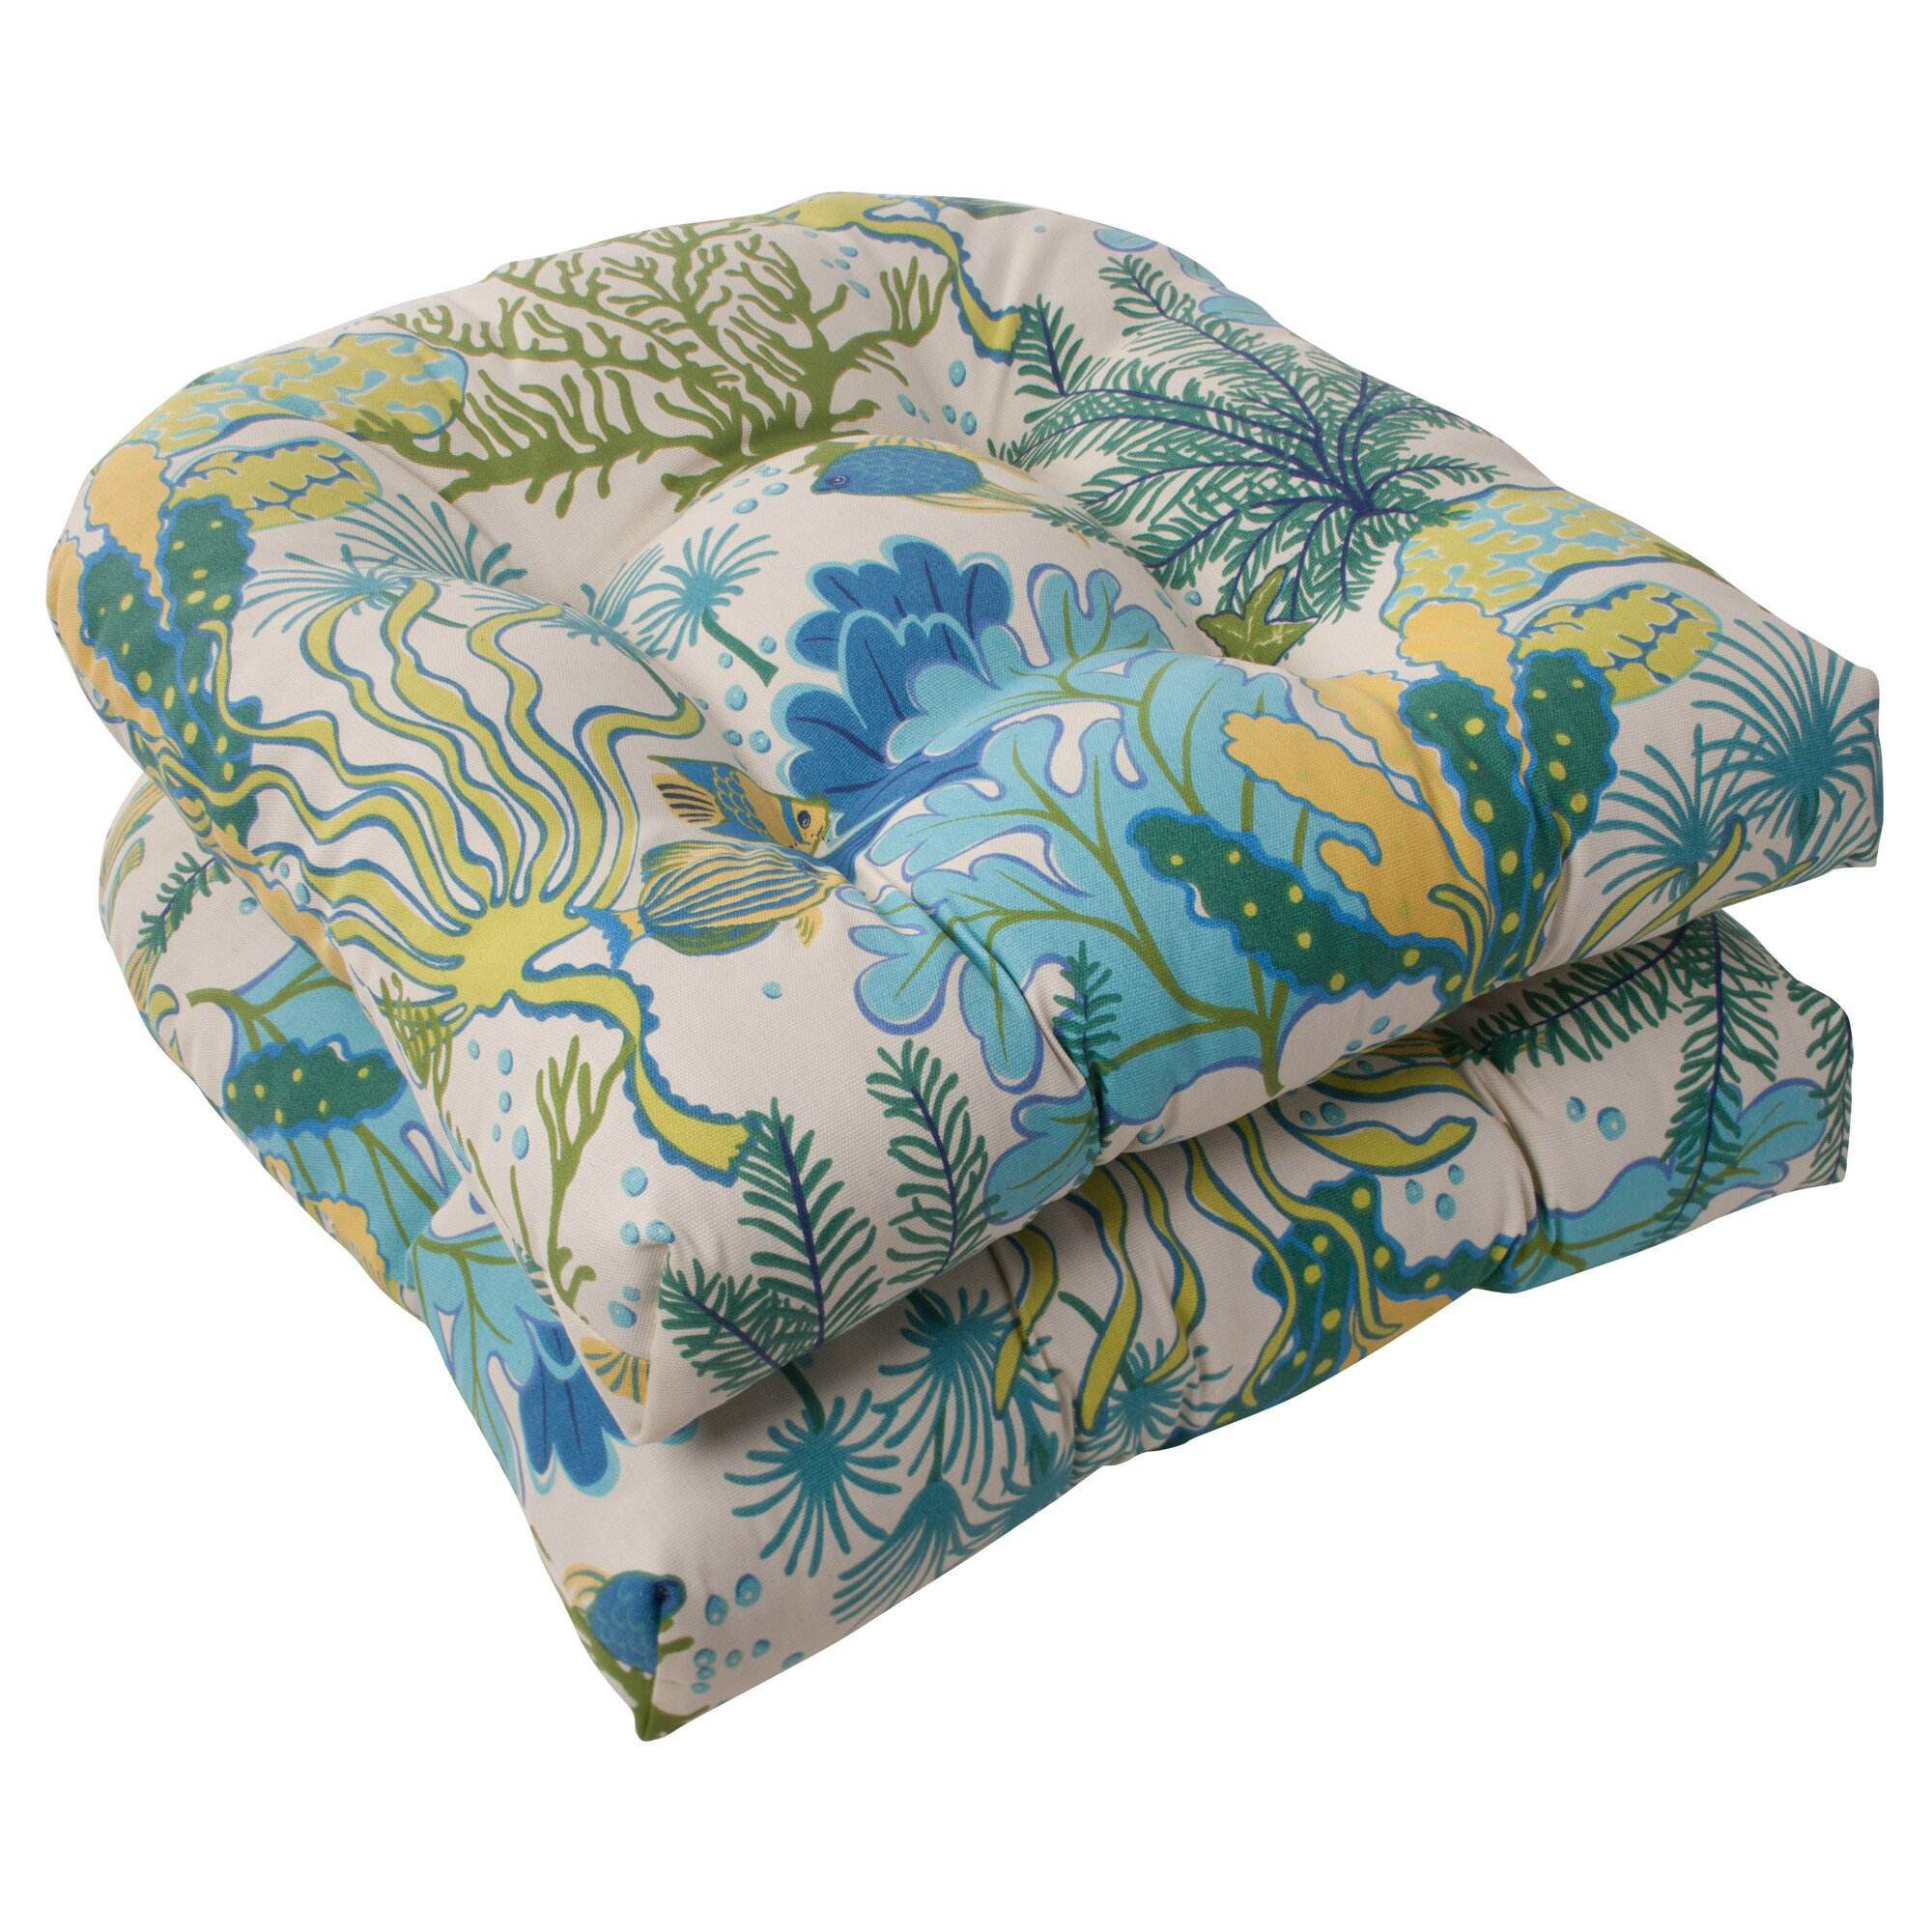 Pillow Perfect Splish Splash Outdoor Wicker Seat Cushions Set